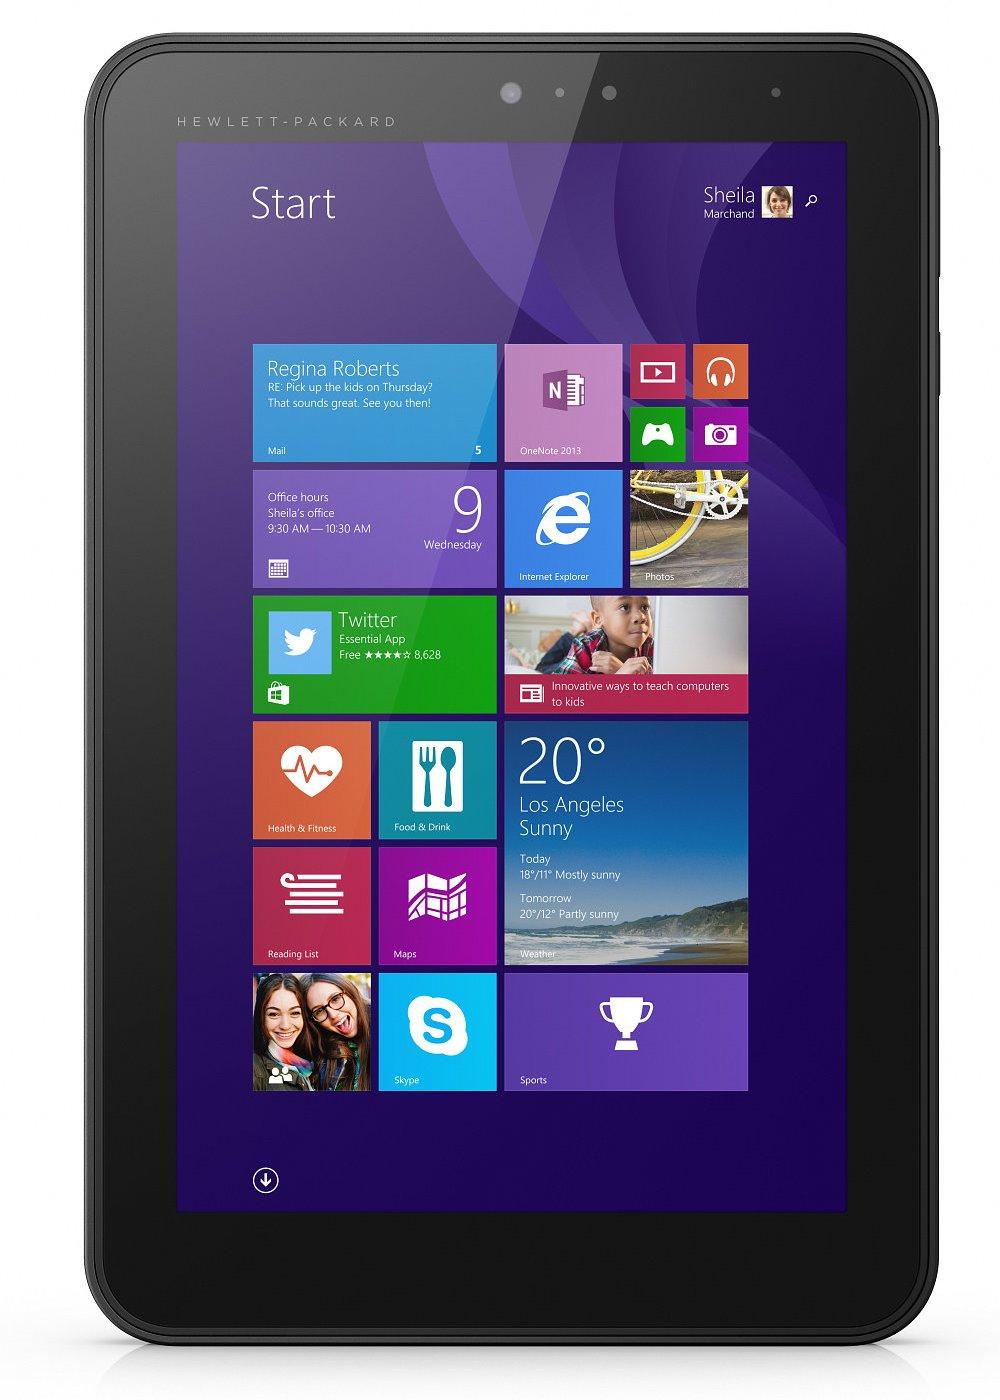 Tablet HP Pro Tablet 408 G1 Tablet, 8, Intel Atom Z3736F, 2 GB, 64 GB + MicroSD, microHDMI, WiFi, BT, Stylus, Win10 Pro H9X72EABCM